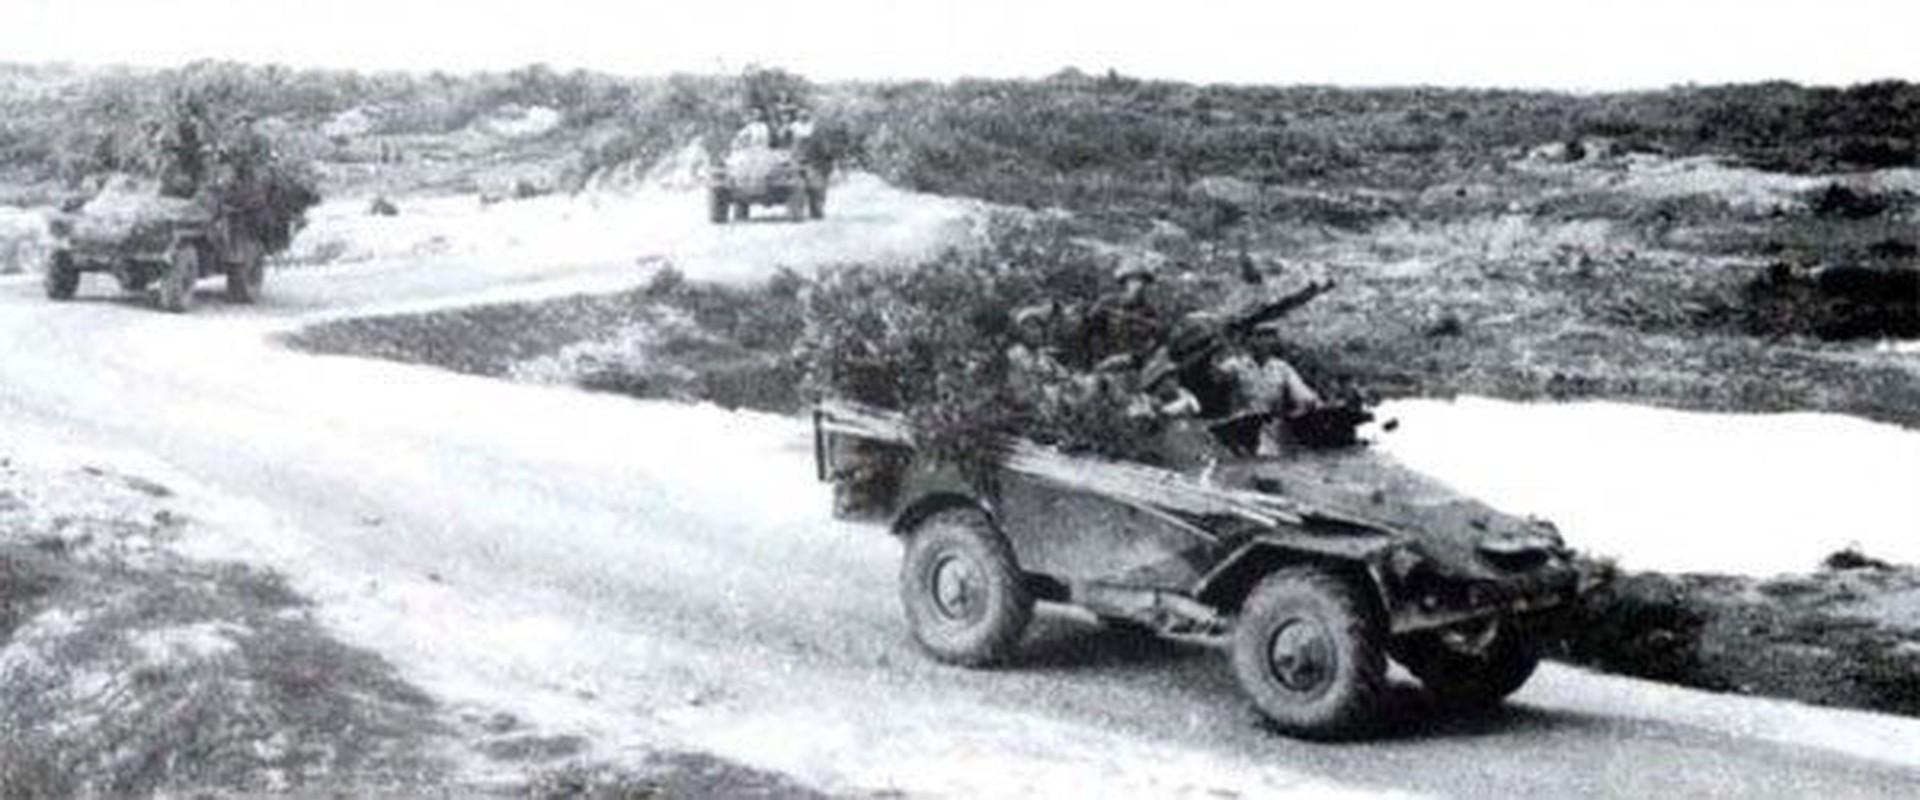 Nga bat ngo khi Viet Nam cai bien thiet giap thanh phao phong khong-Hinh-8